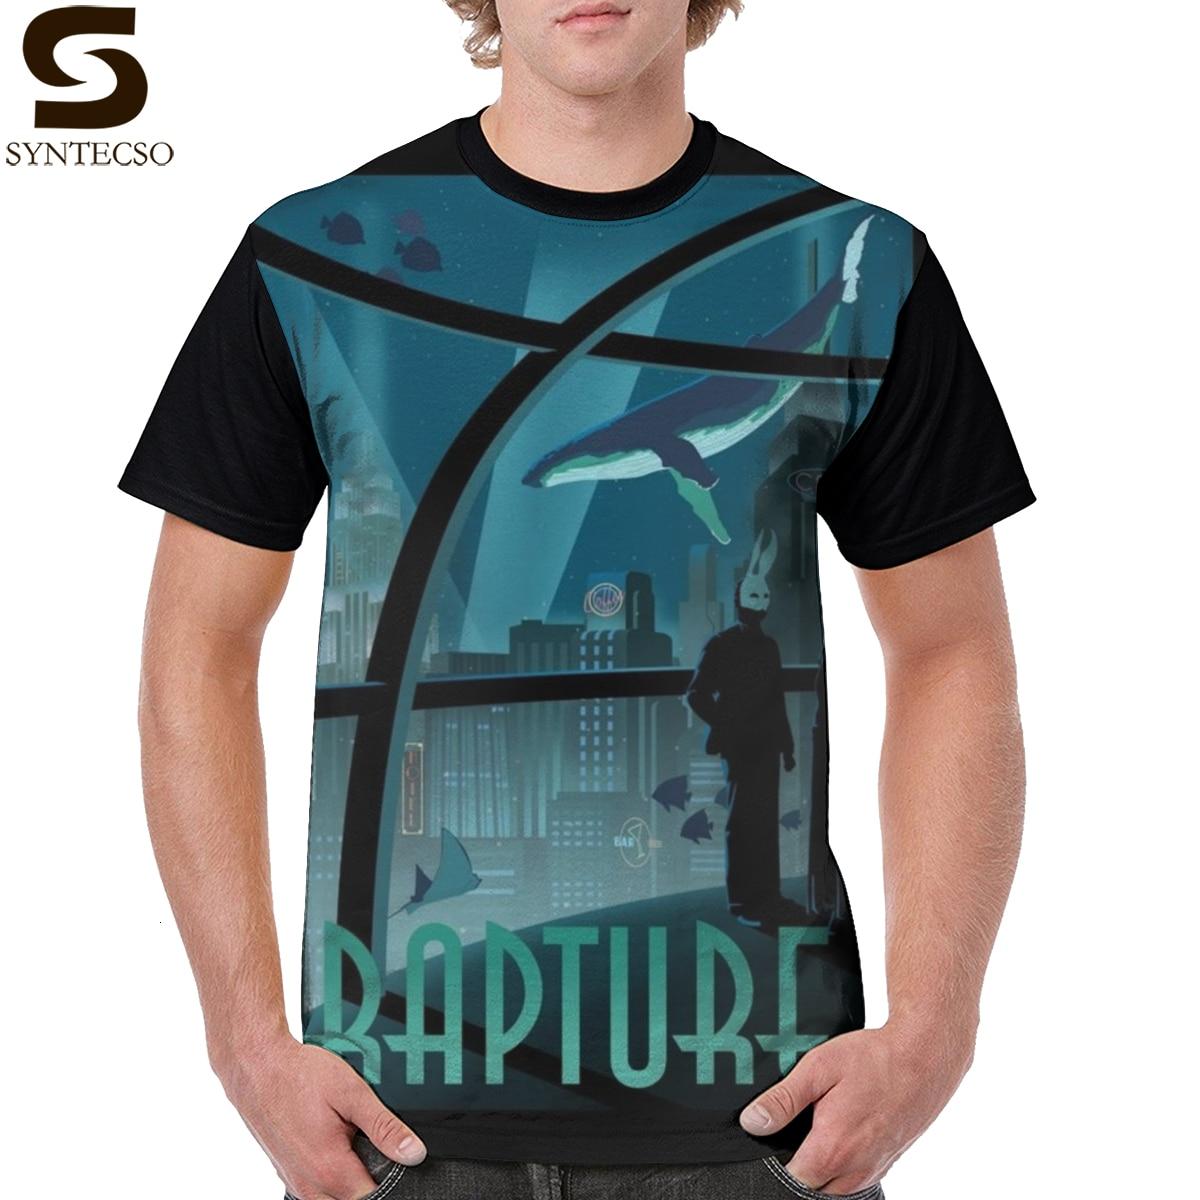 Camisa de t de choque do sistema rapture-bioshock camiseta impressa casual camiseta masculina bonito 5x poliéster gráfico tshirt